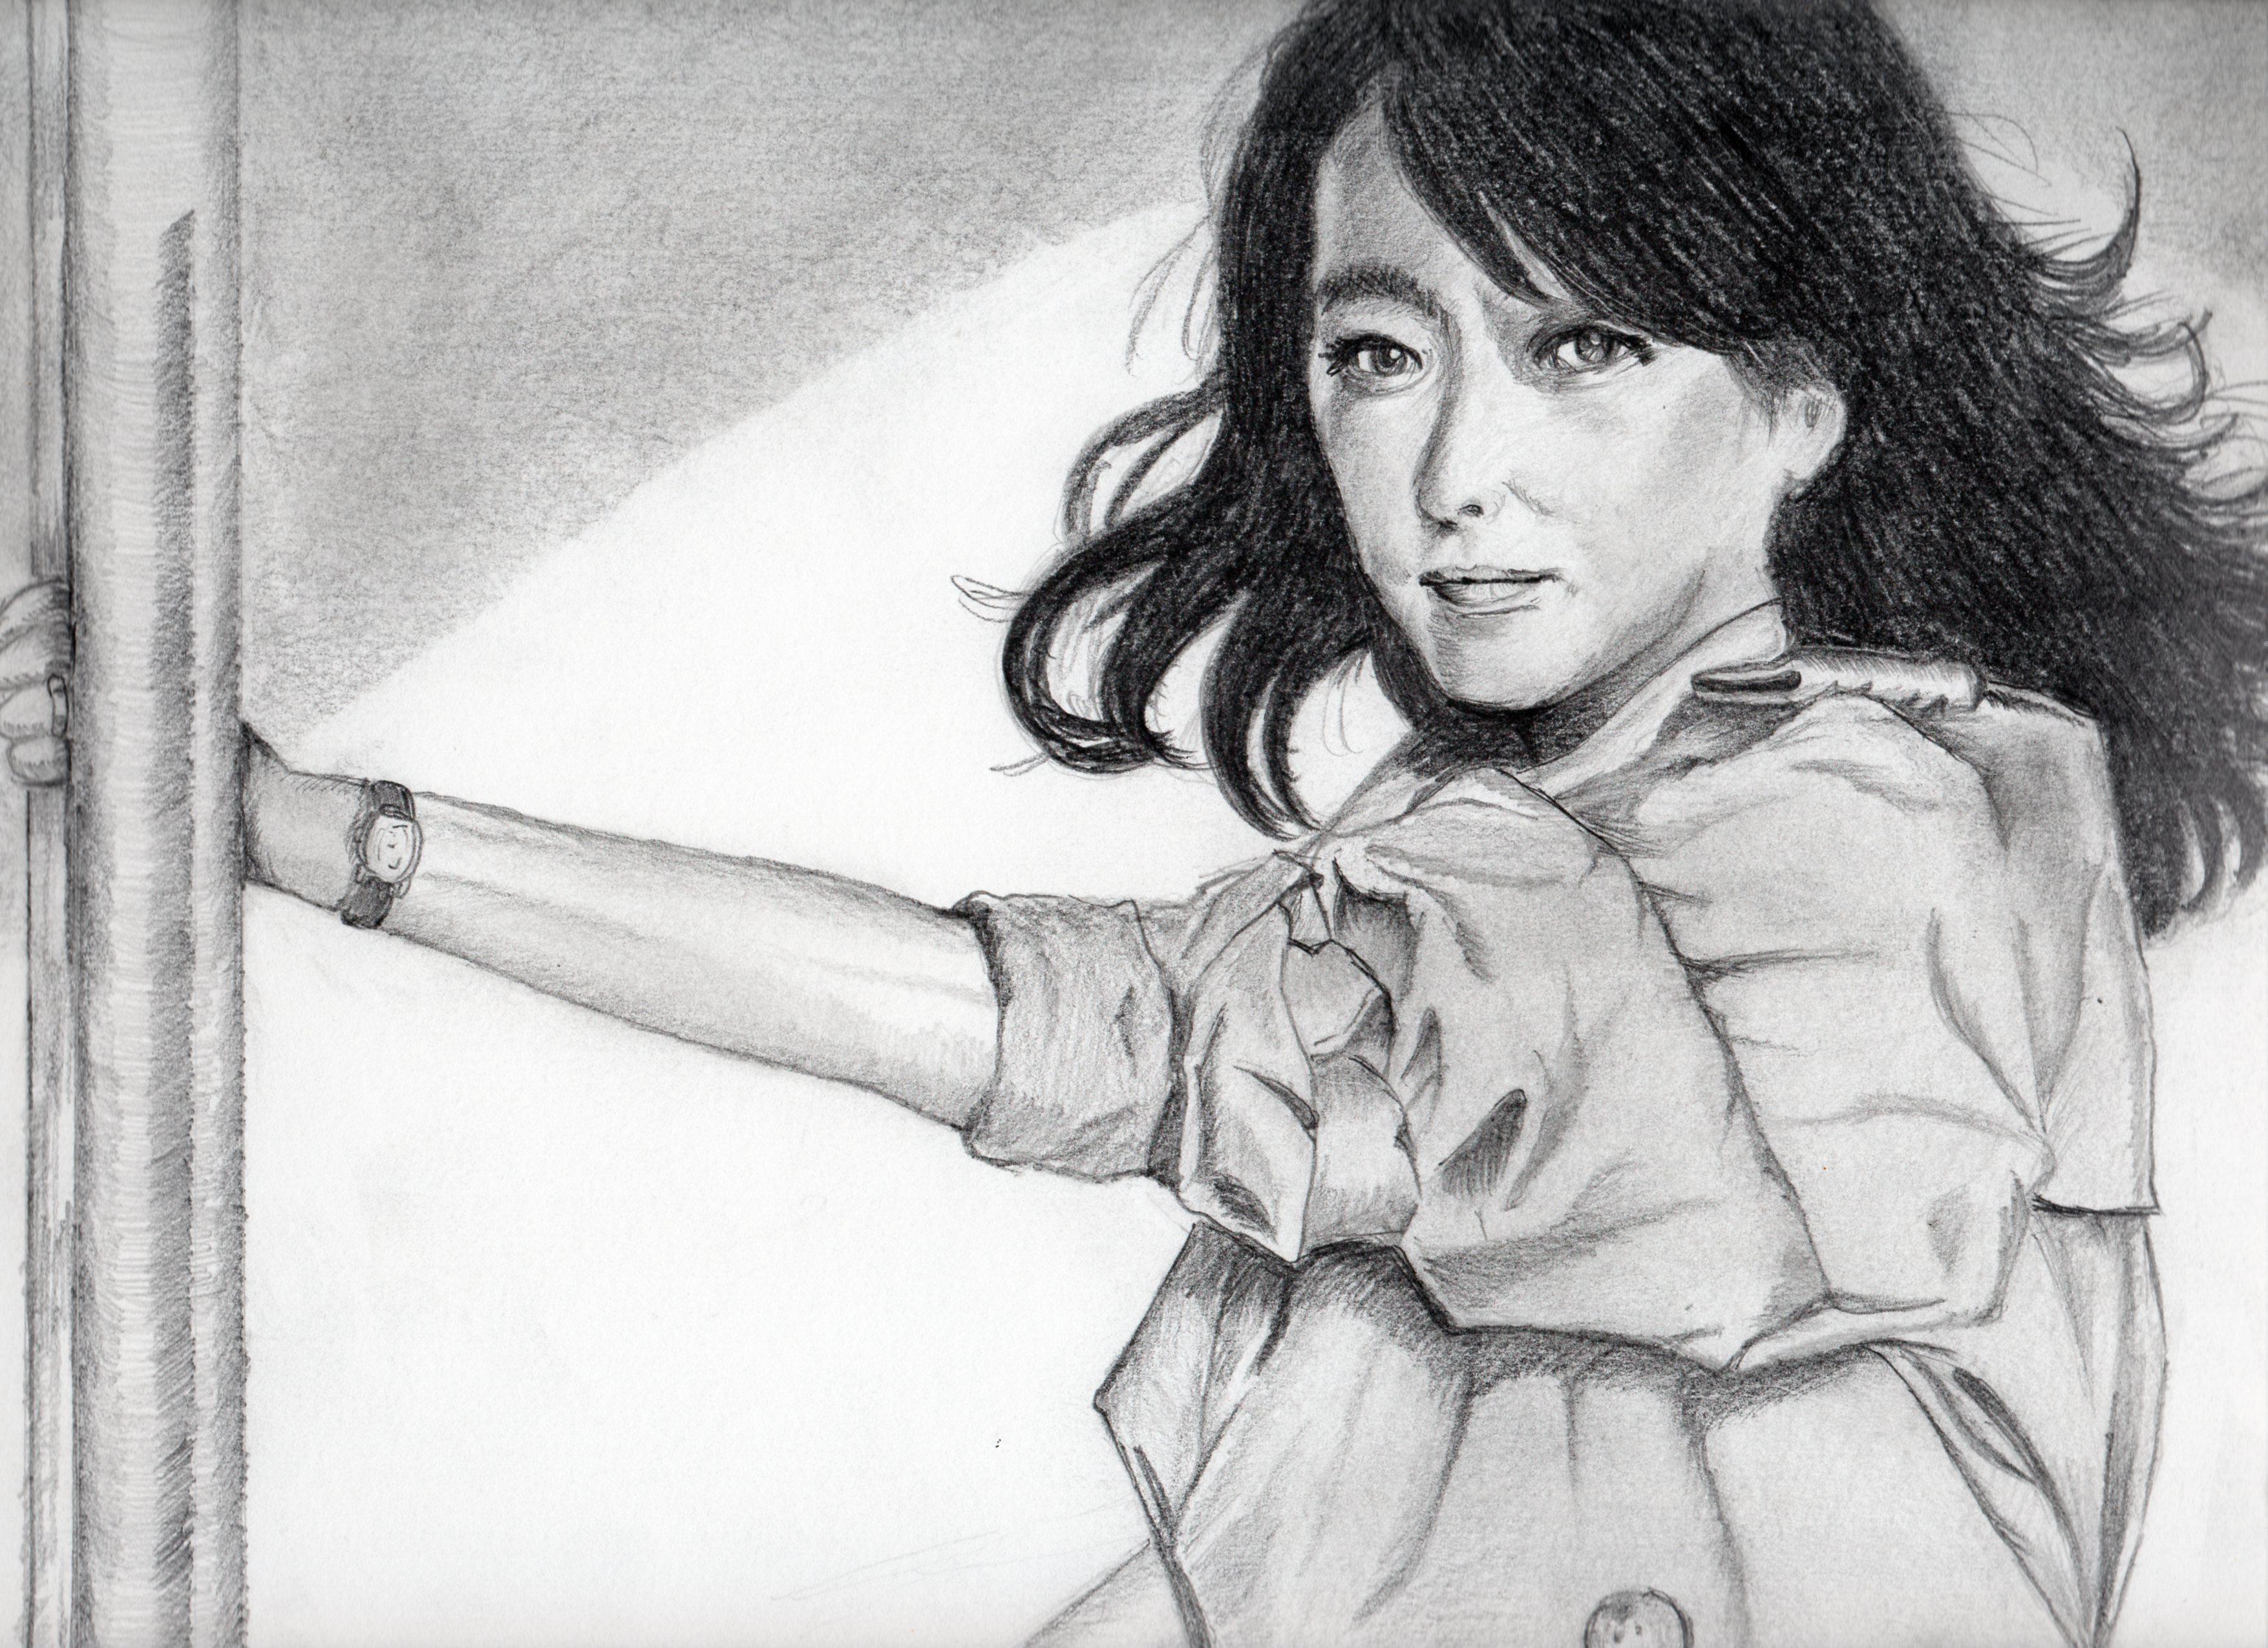 小林麻美の鉛筆画似顔絵、小林麻美のリアル鉛筆画似顔絵